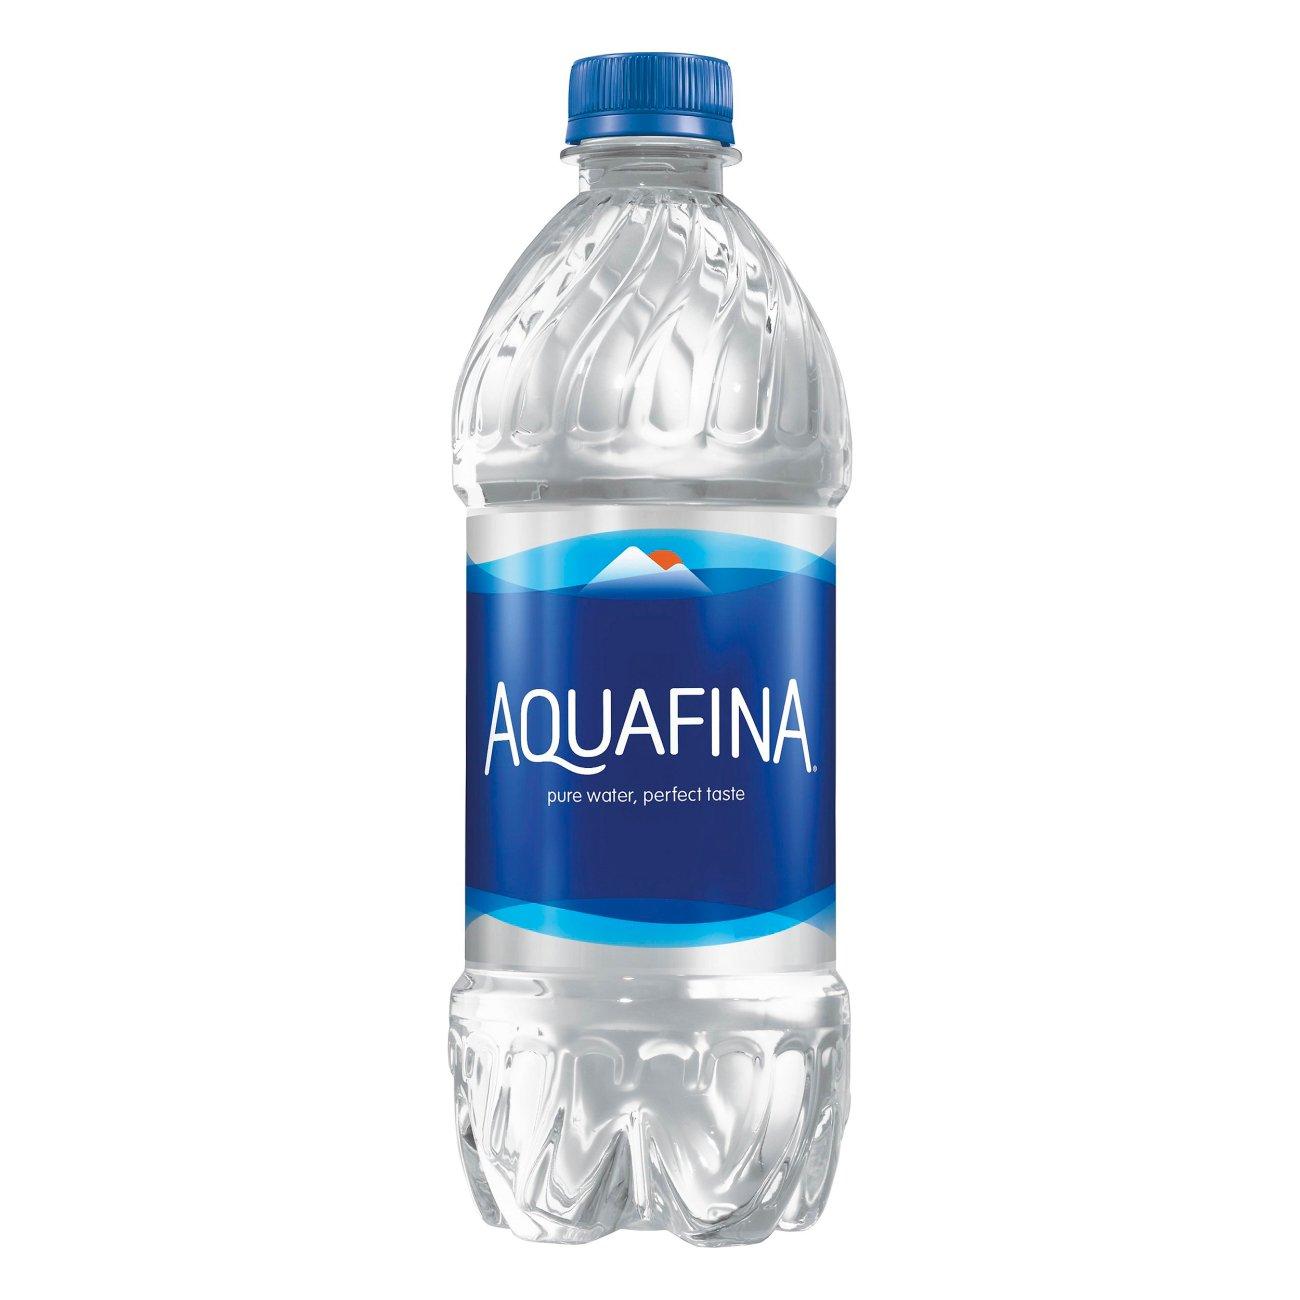 Aquafina Purified Drinking Water - Shop